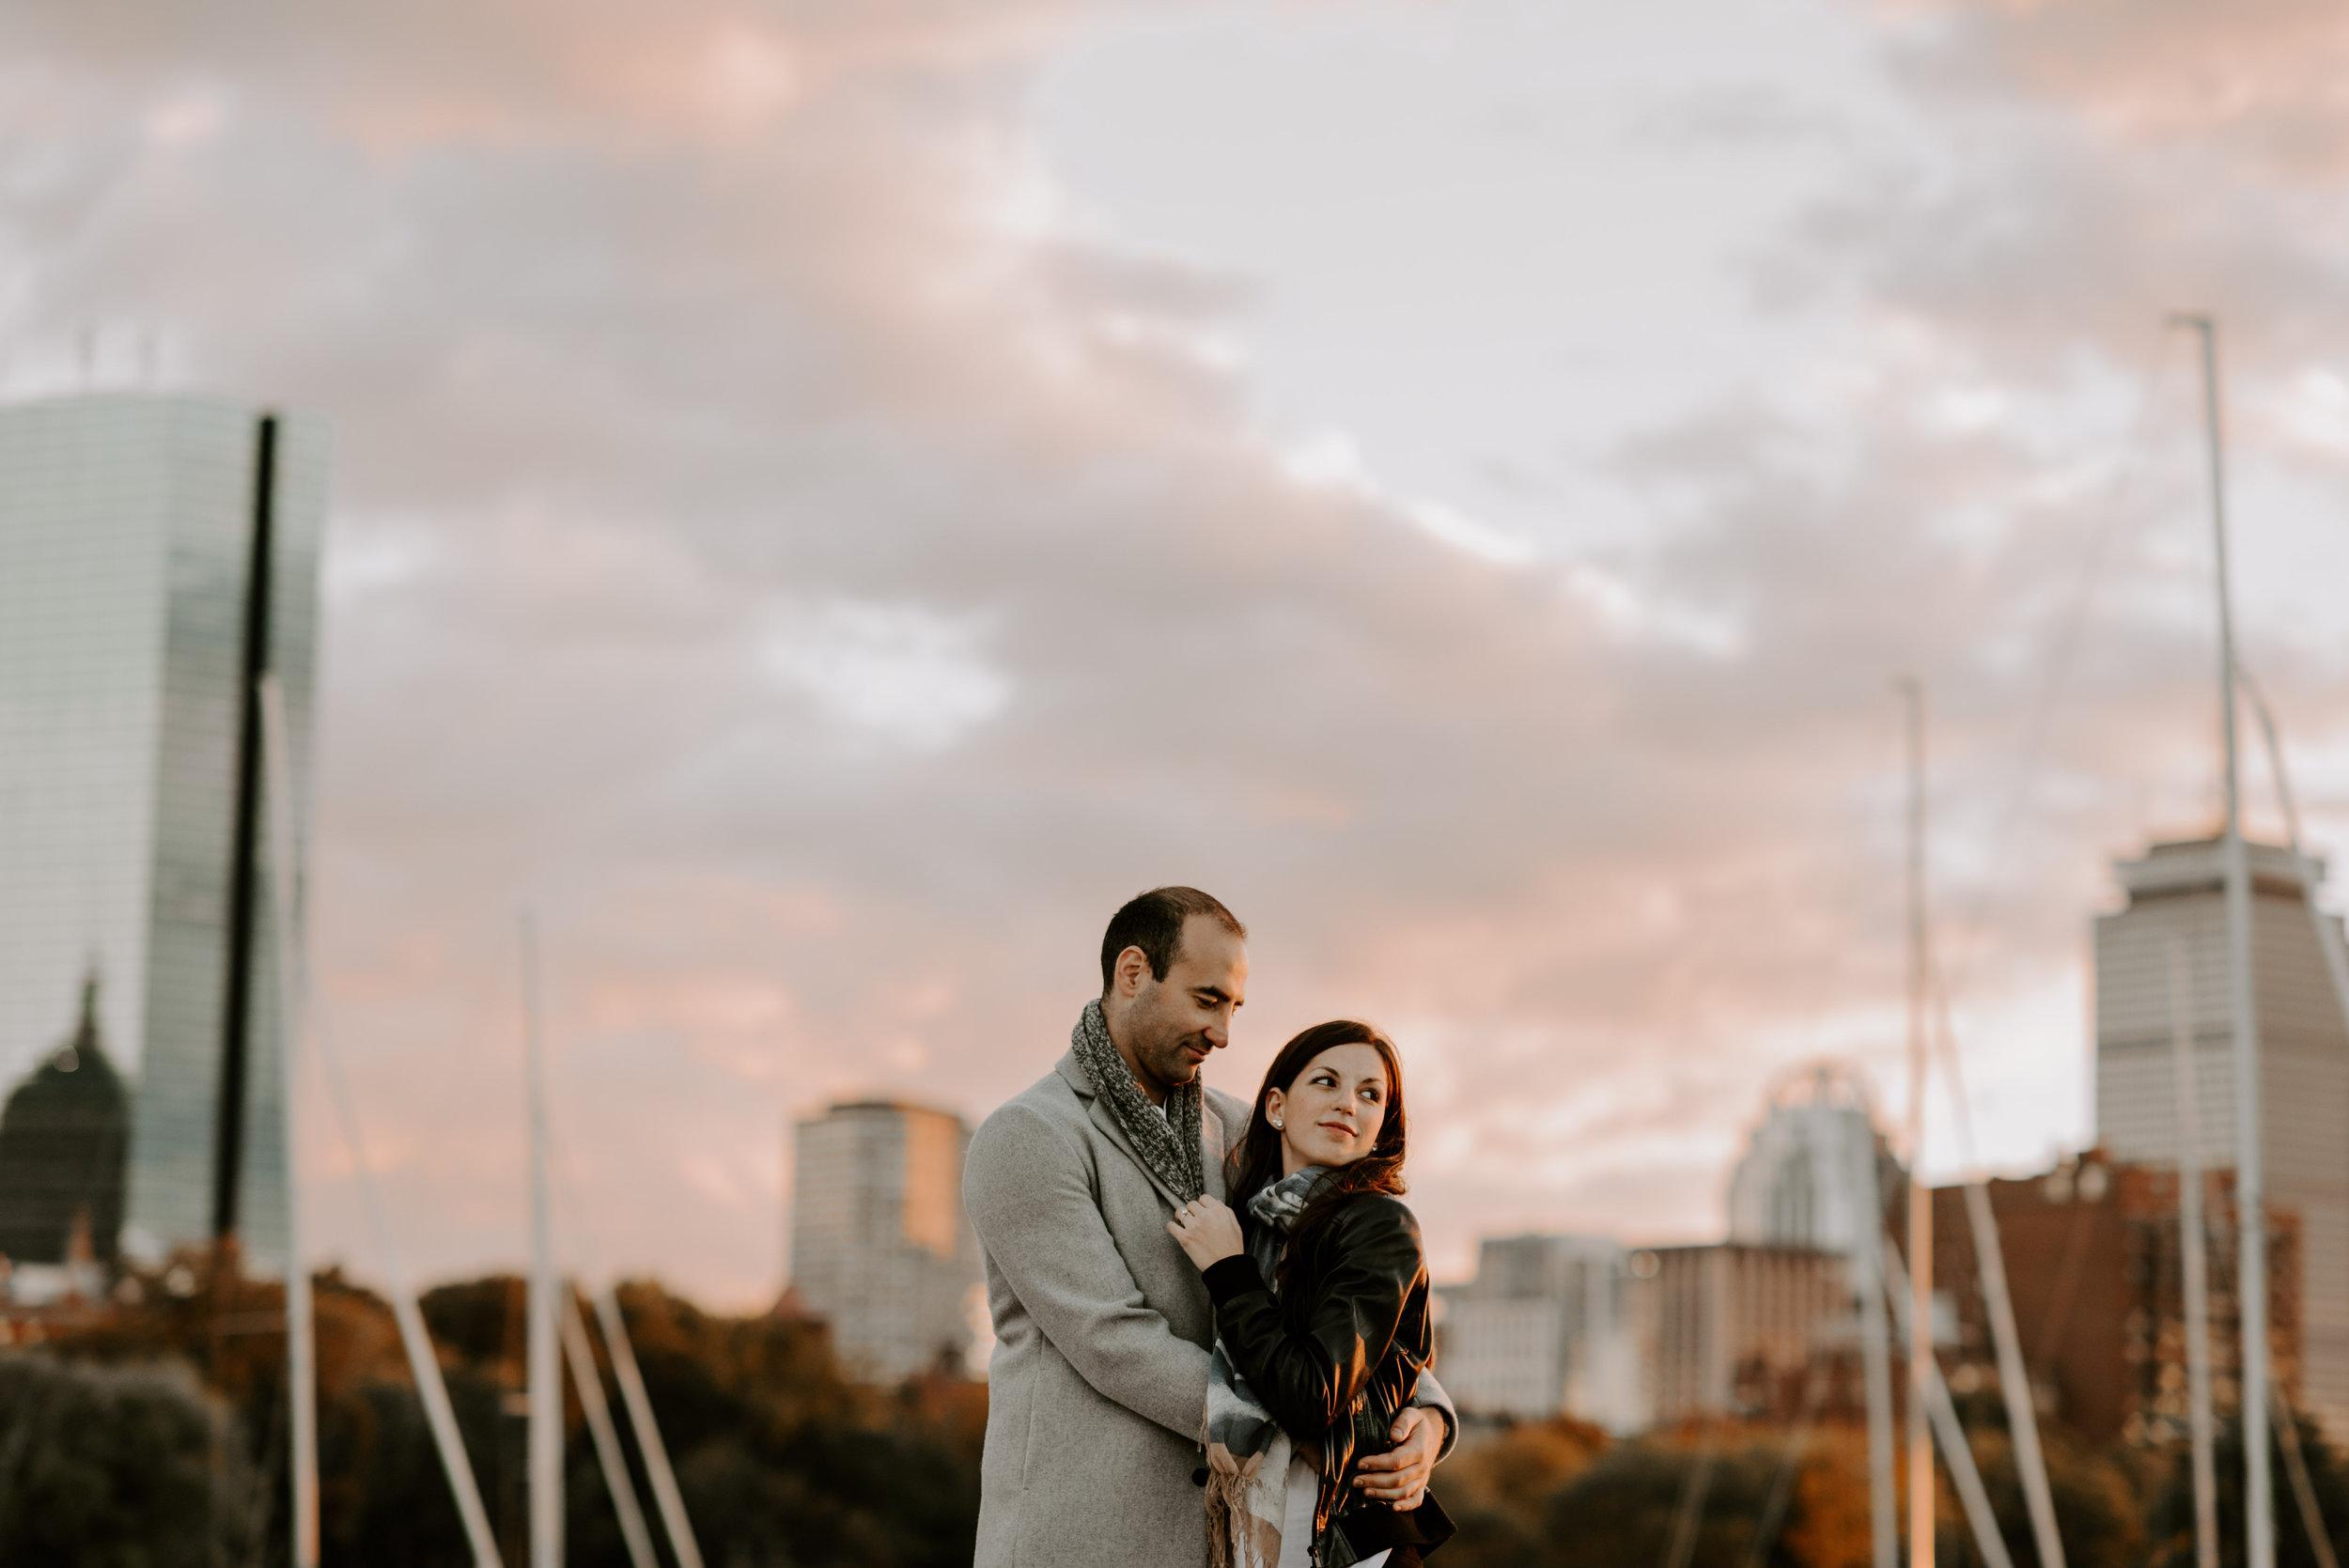 Dramatic and Moody Charles River, Boston Engagement Session | Boston Wedding Photographer | Madeline Rose Photography Co.